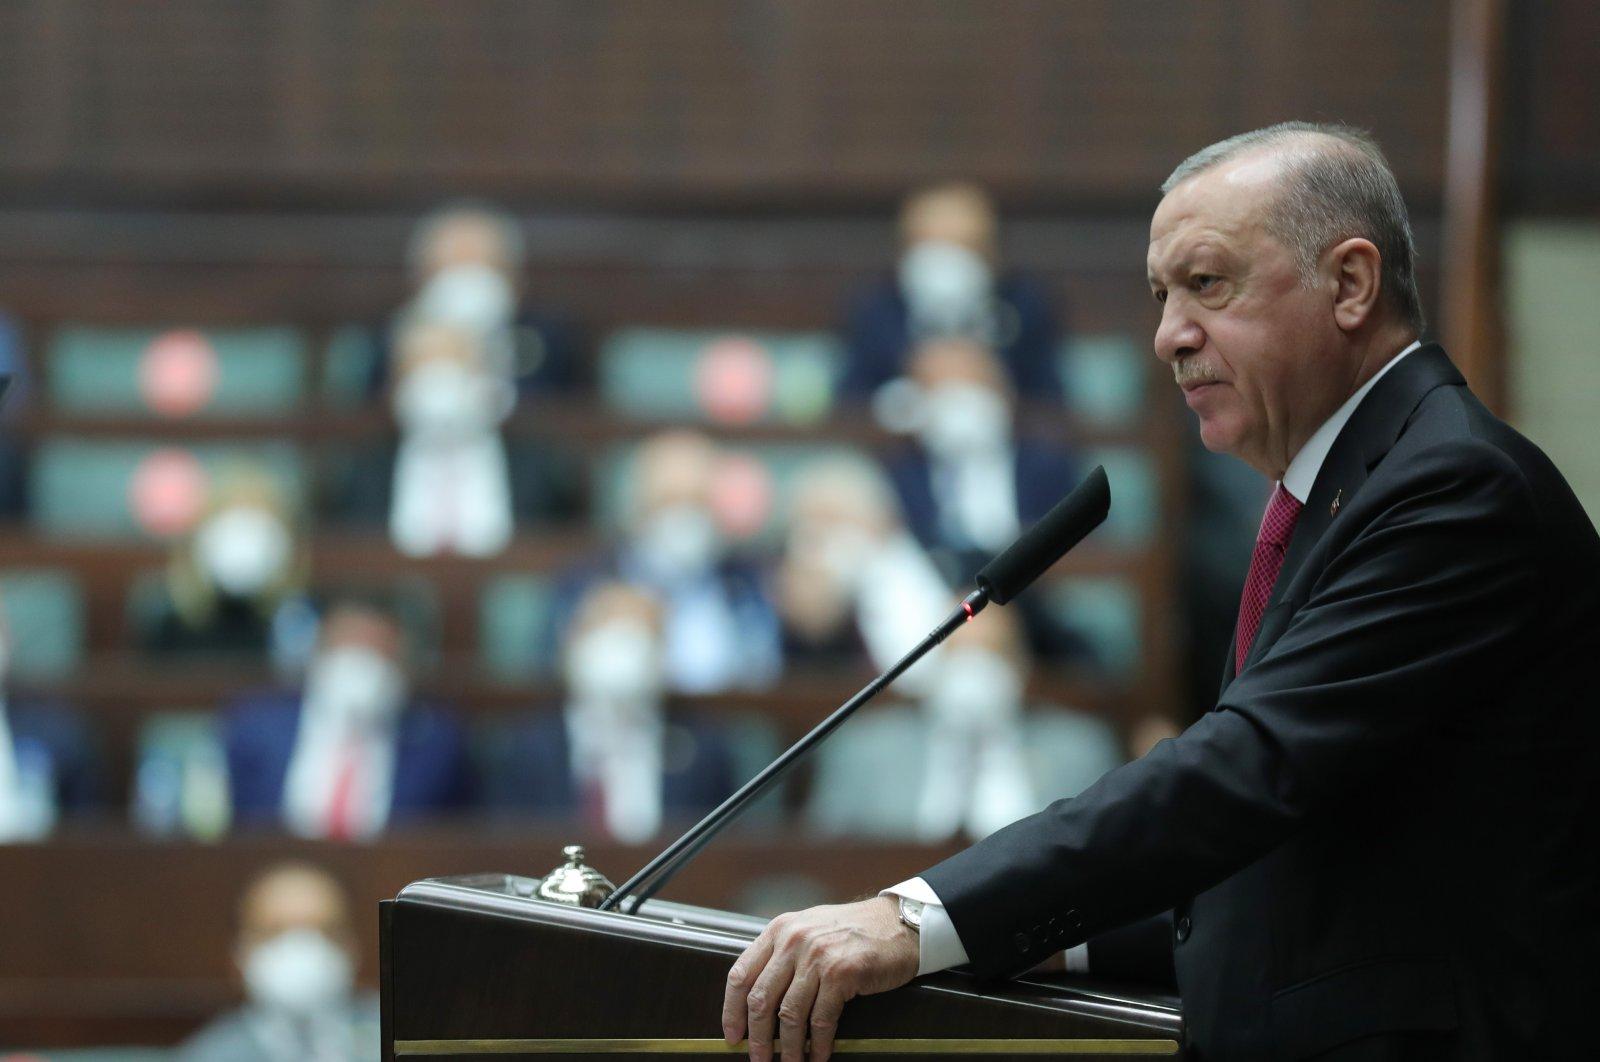 President Recep Tayyip Erdoğan speaks at the AK Party parliamentary group meeting, Ankara, Turkey, June 9, 2021. (AA Photo)